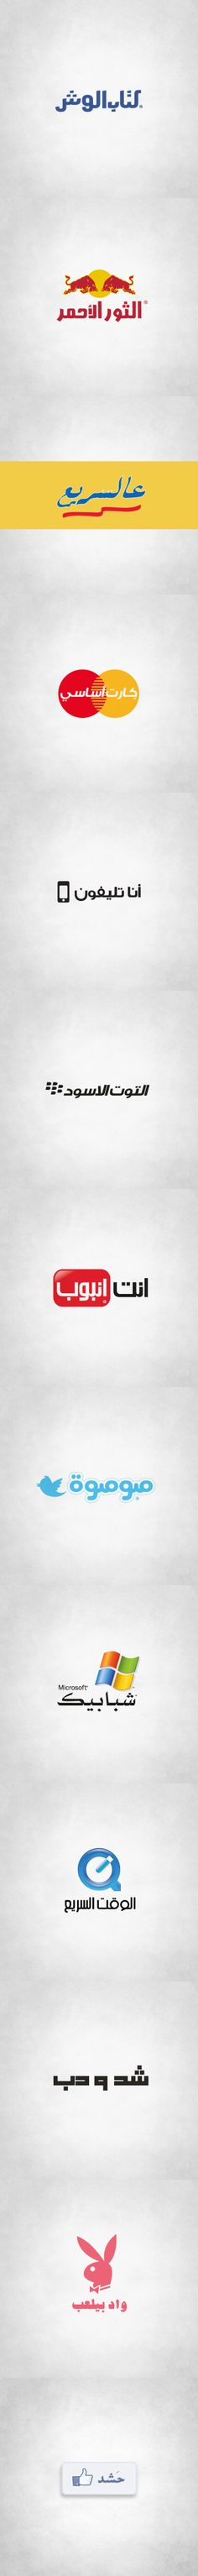 wFamous Brands (بس بالمصري) on Behance